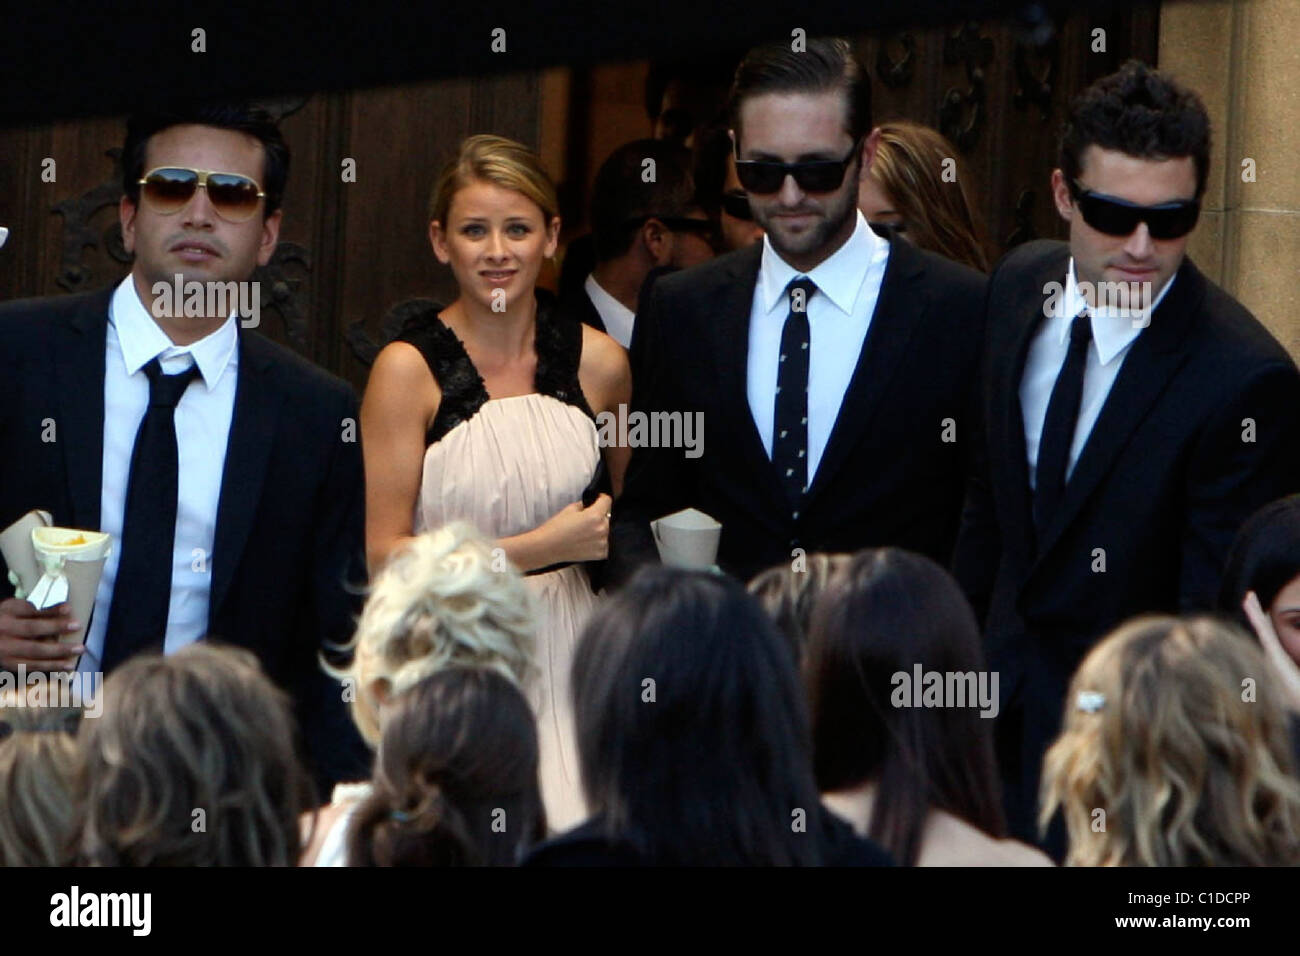 Lauren Bosworth The Hills Stars Spencer Pratt And Heidi Montag Get Stock Photo Alamy